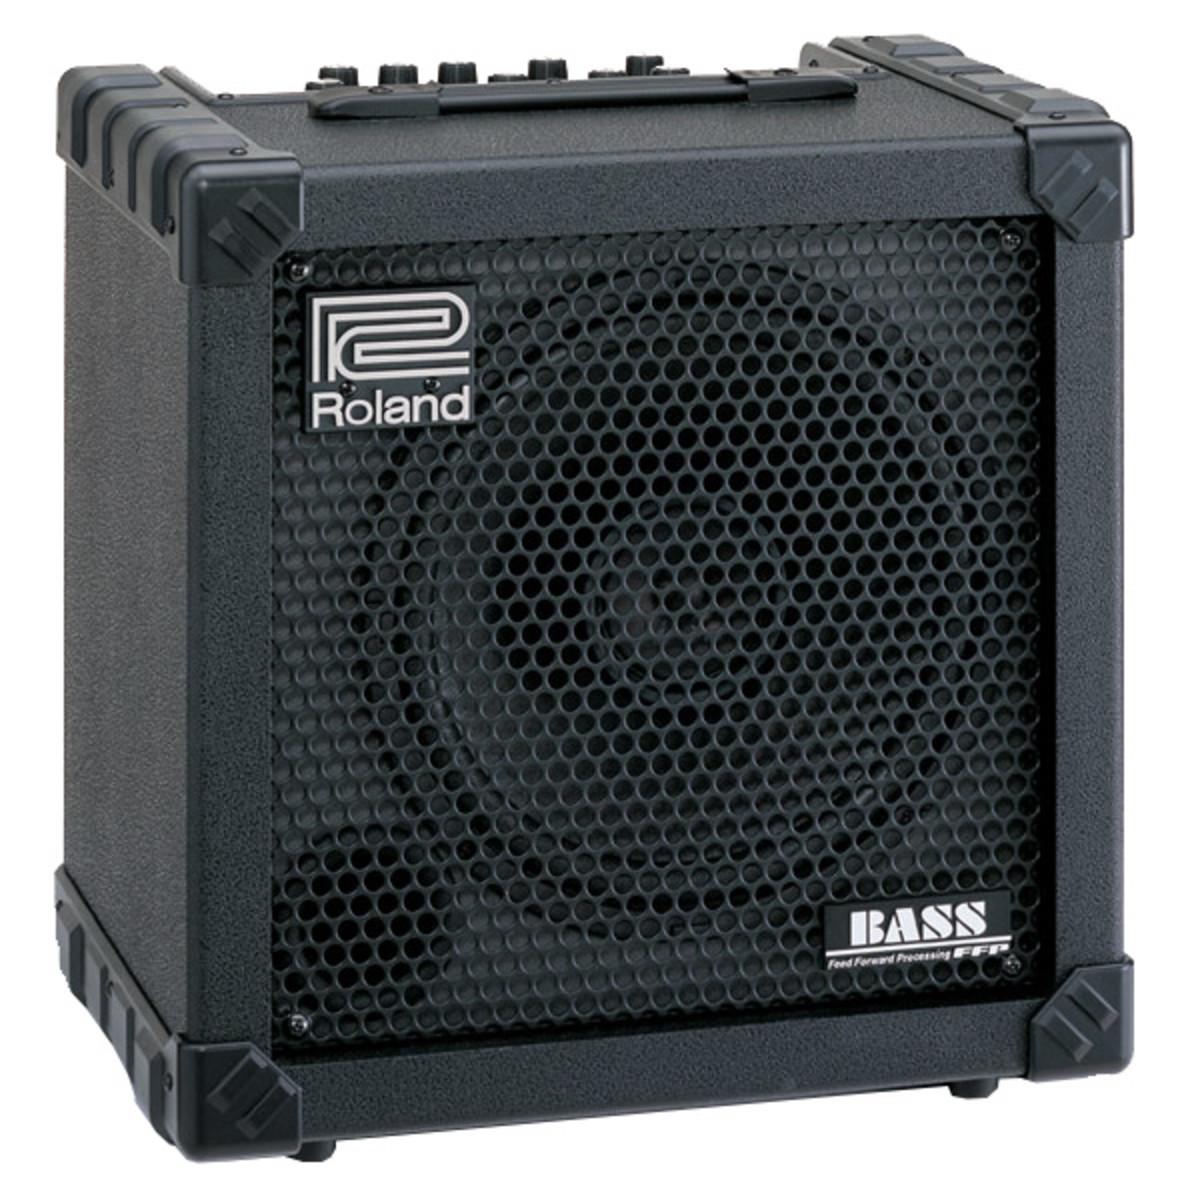 disc roland cube 30 bass bass amp at gear4music. Black Bedroom Furniture Sets. Home Design Ideas